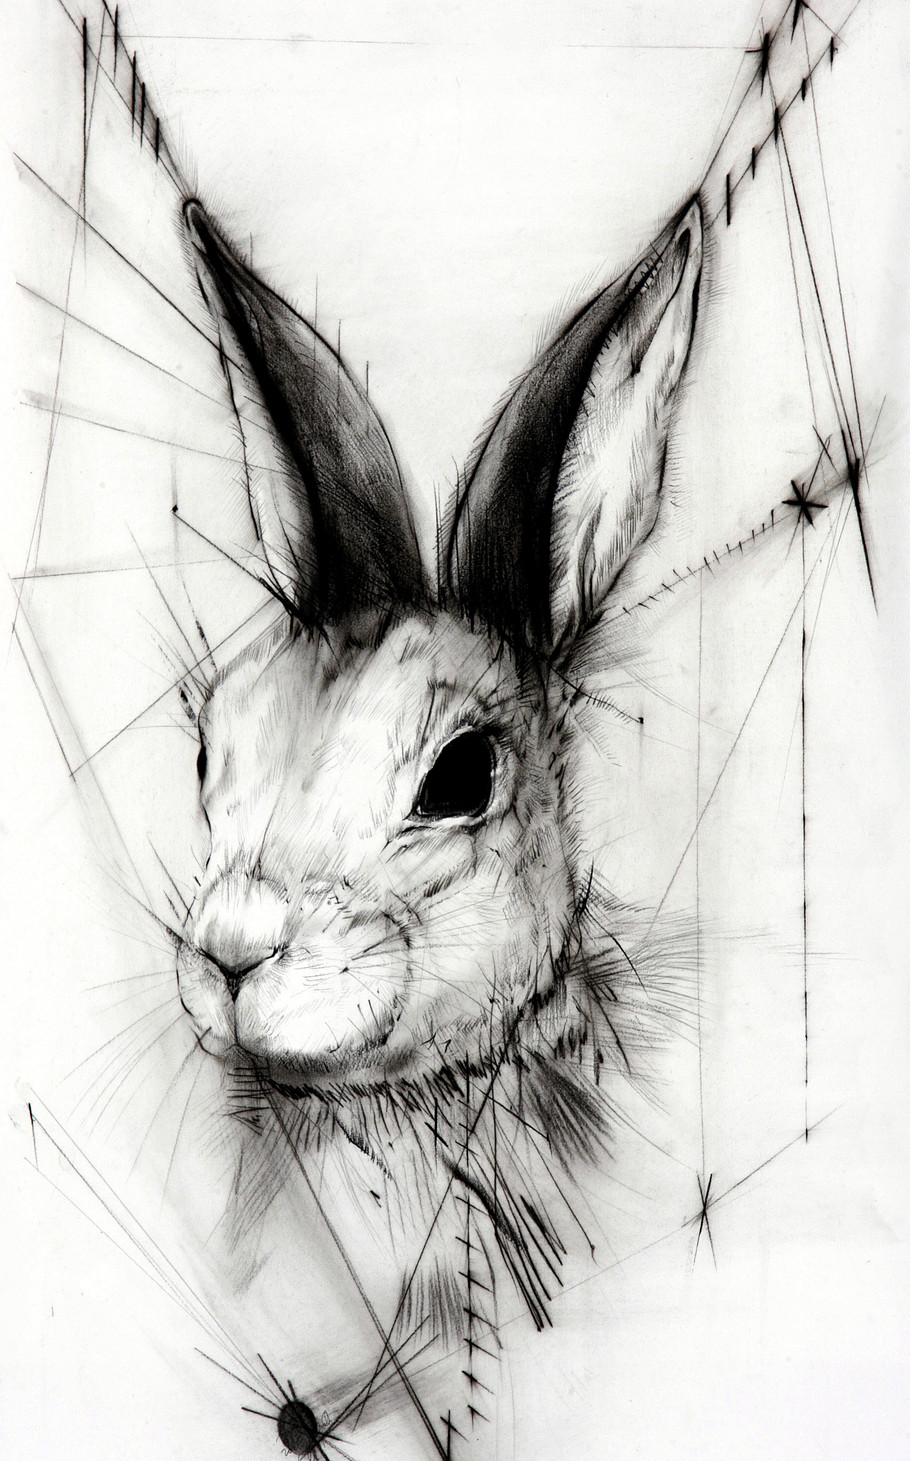 Deaf rabbit